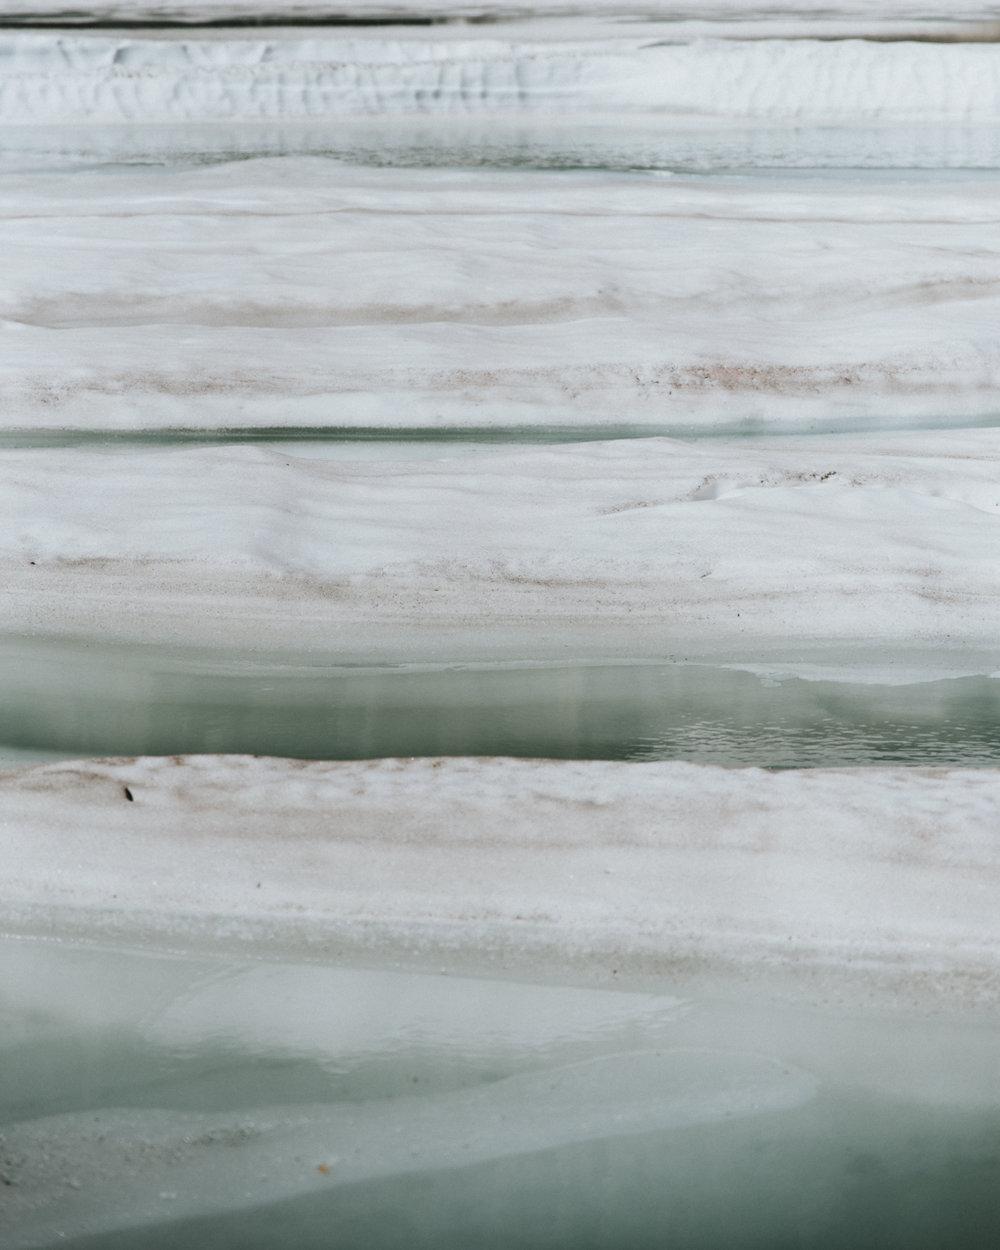 GlacierBlog048.jpg